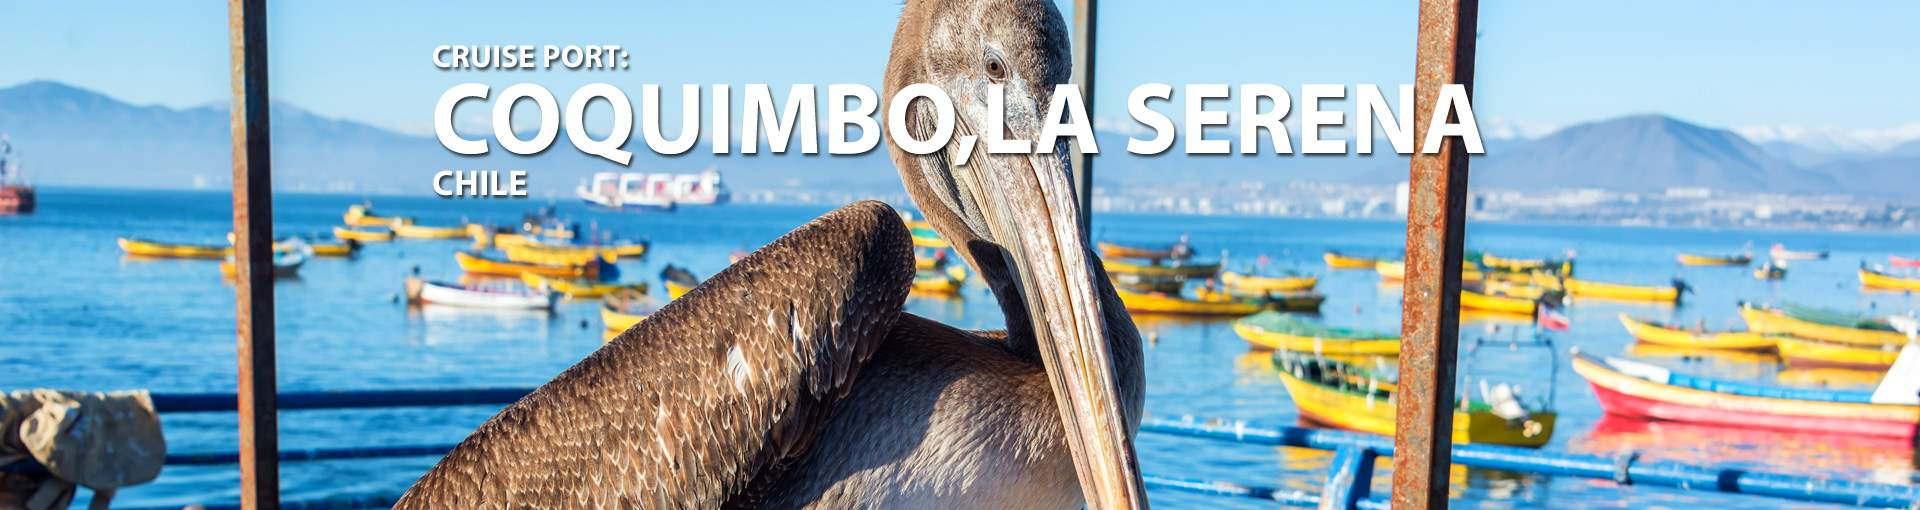 Cruises to Coquimbo La Serena Chile